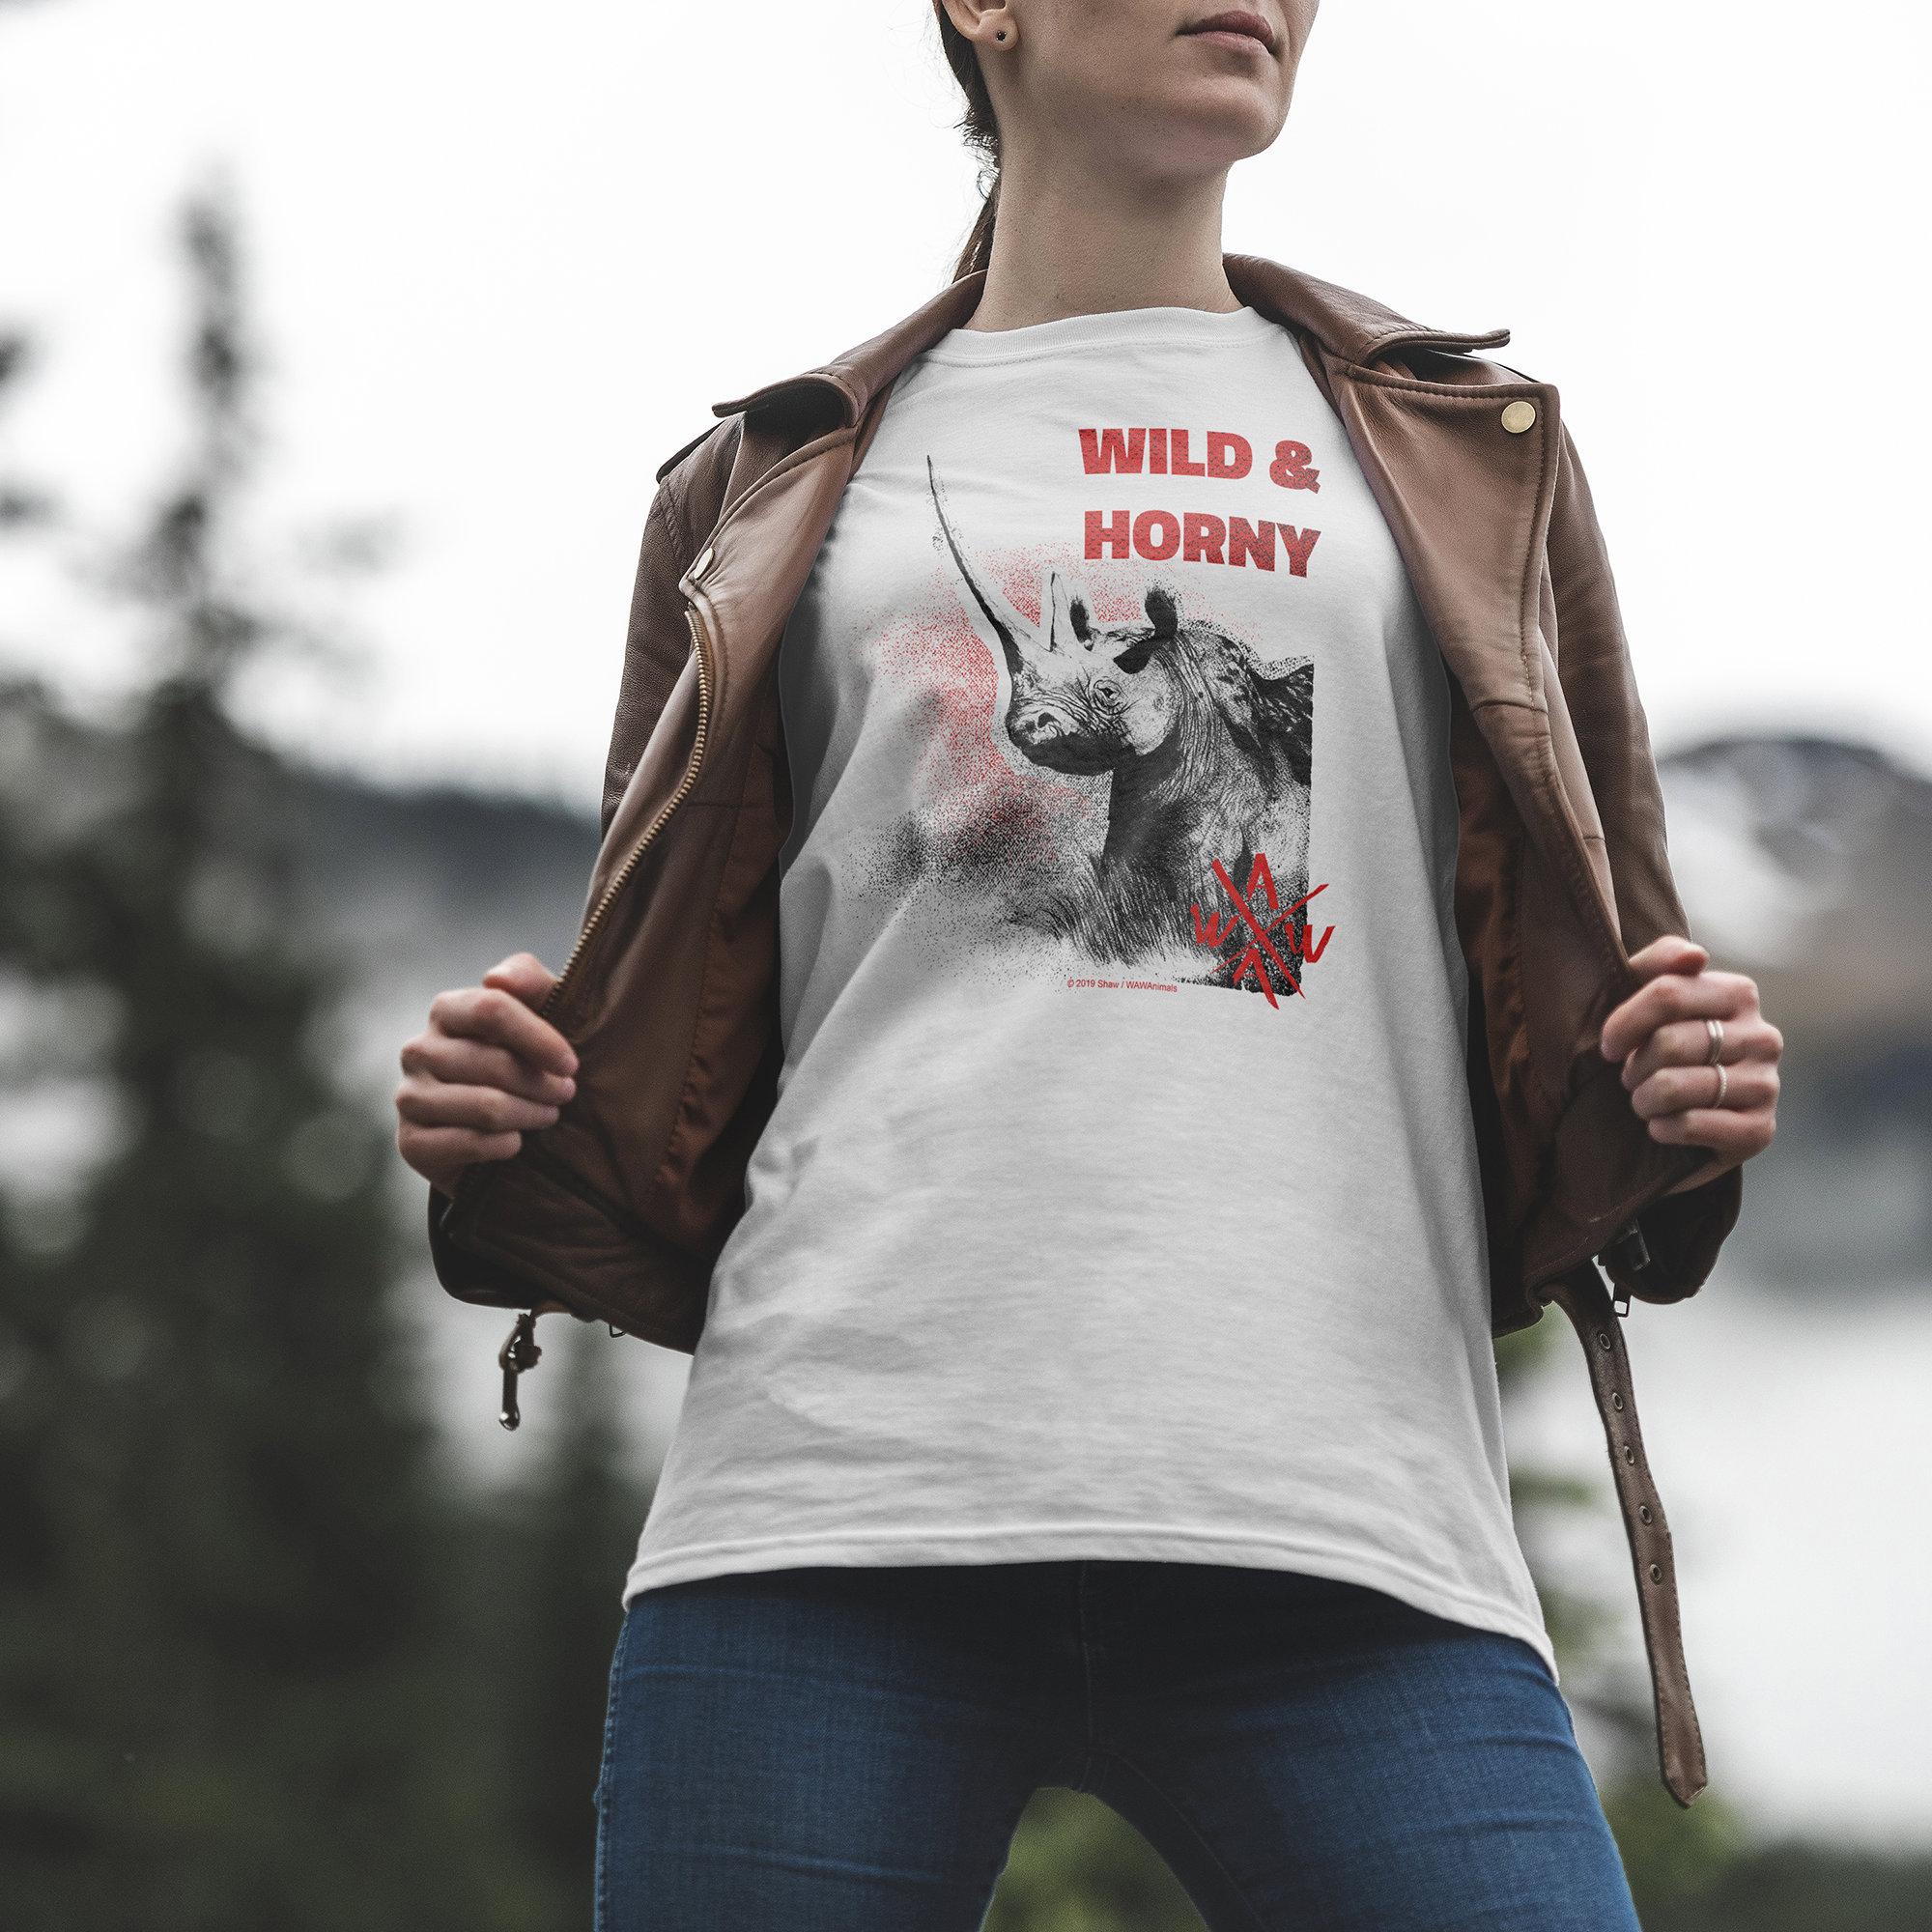 Wild Animal T-shirt - Wild & Horny Rhino Unisex Tshirt